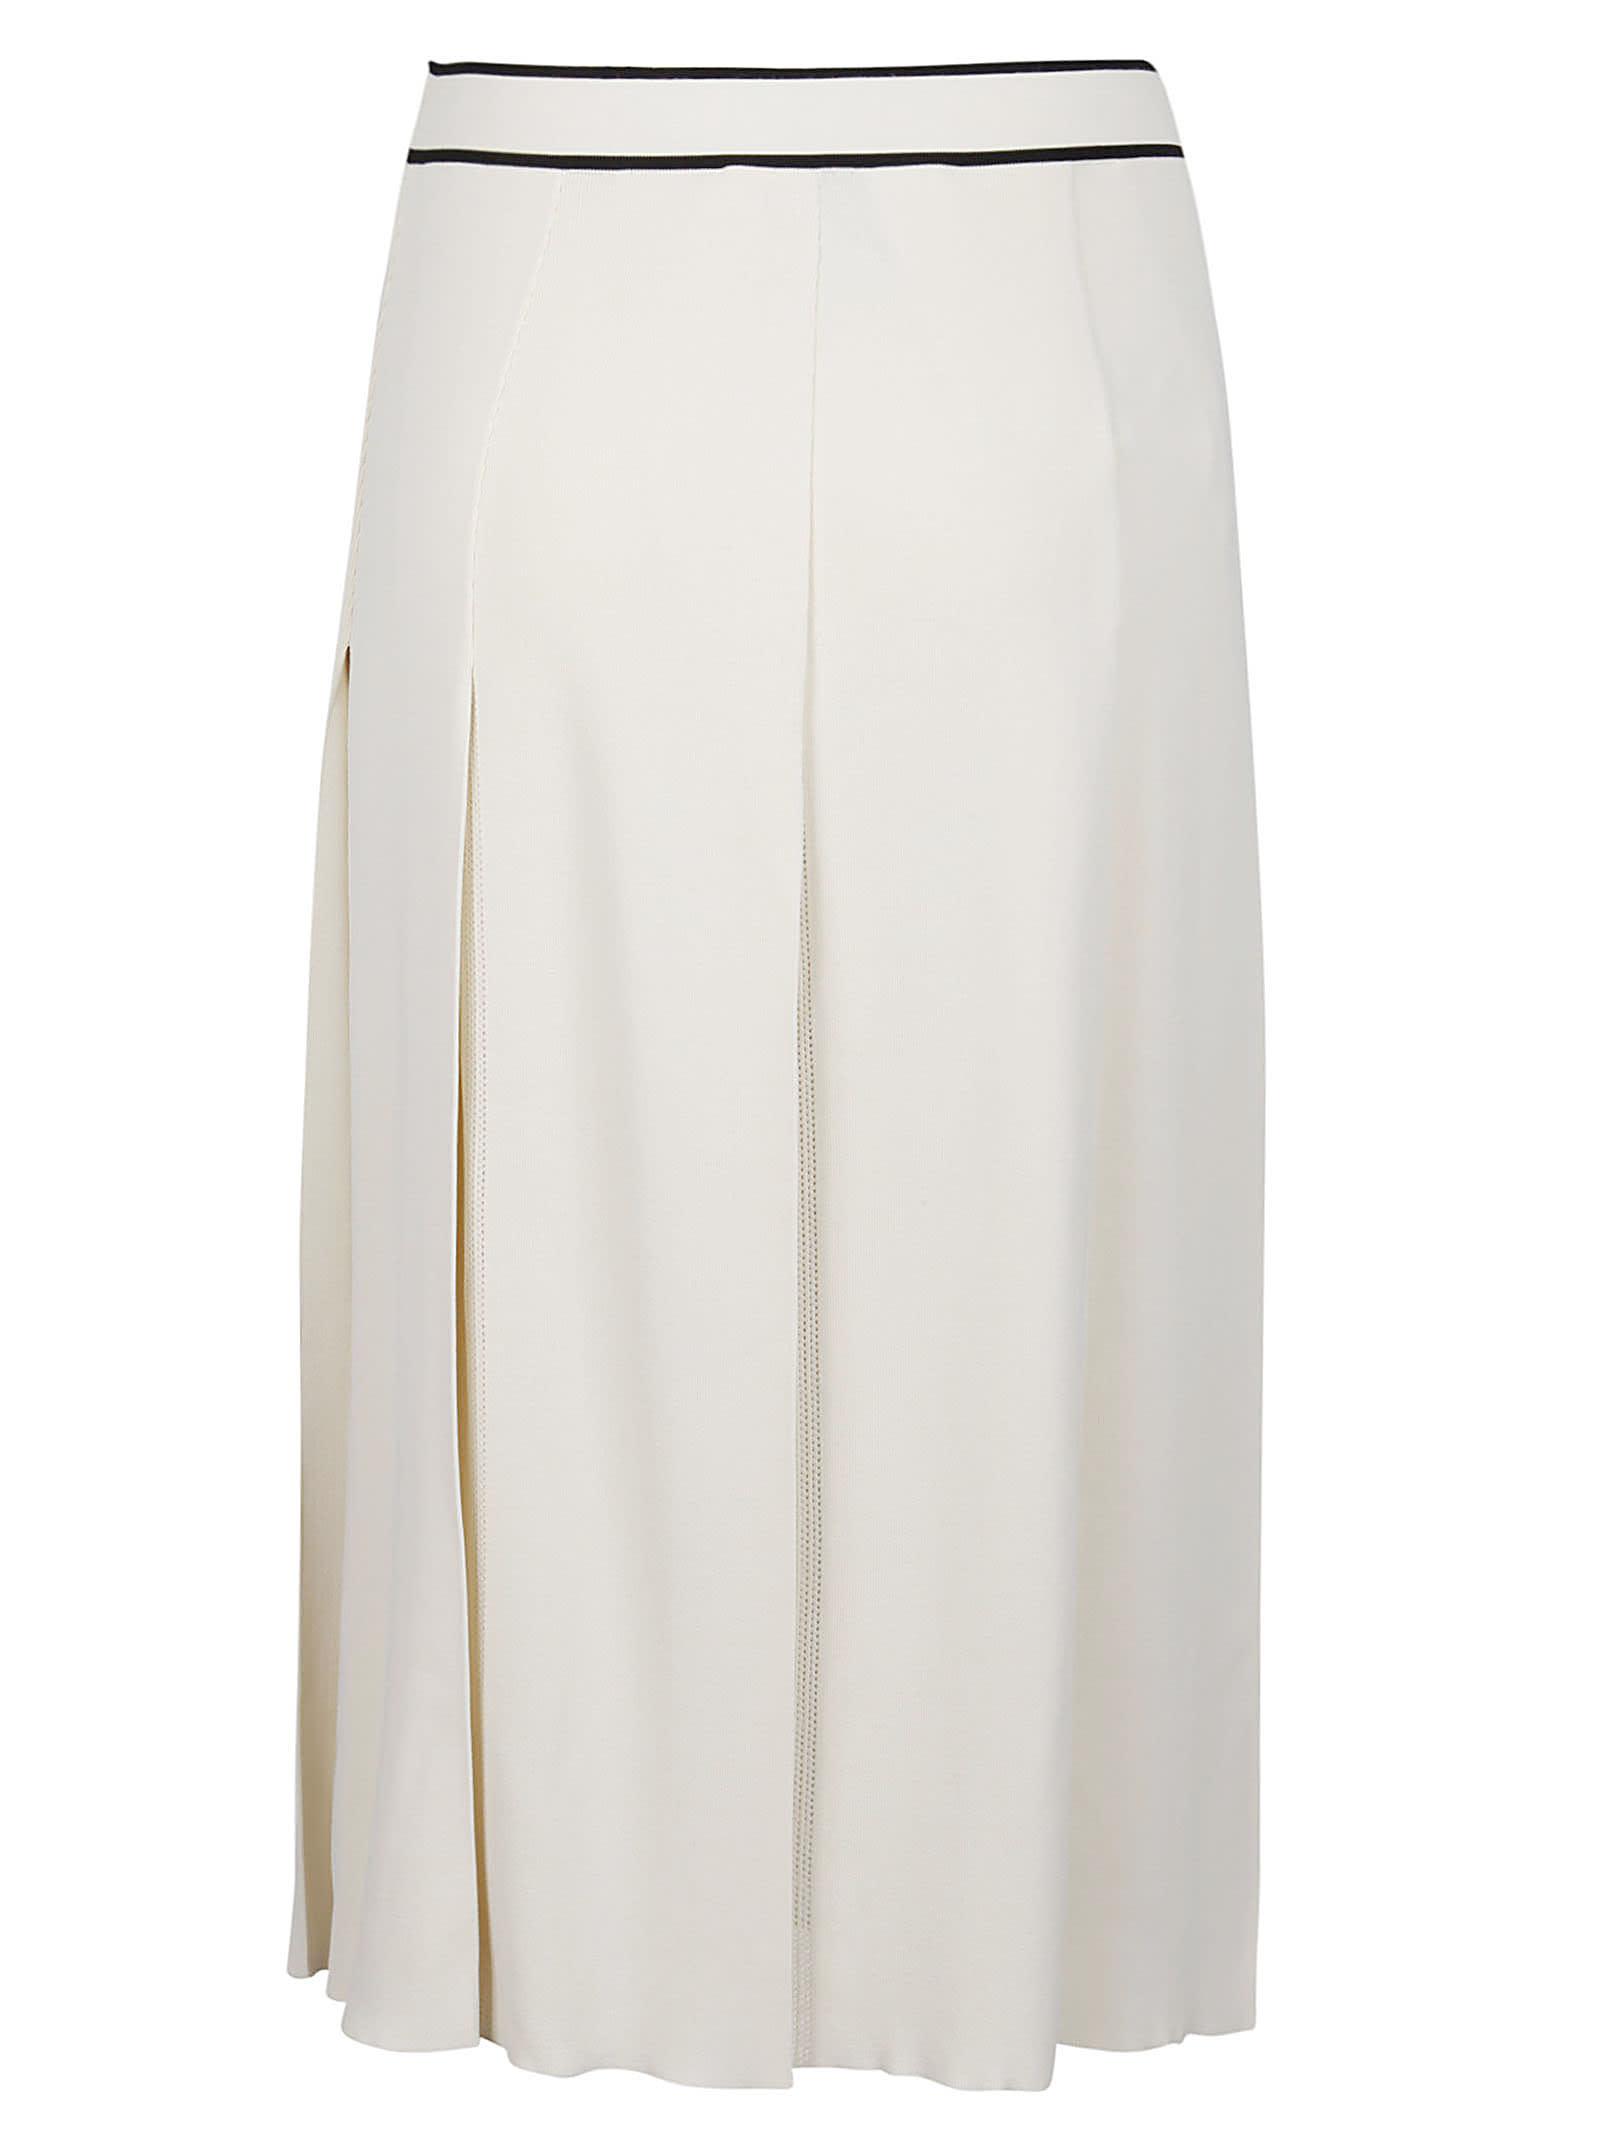 Gucci High-waist Pleated Skirt